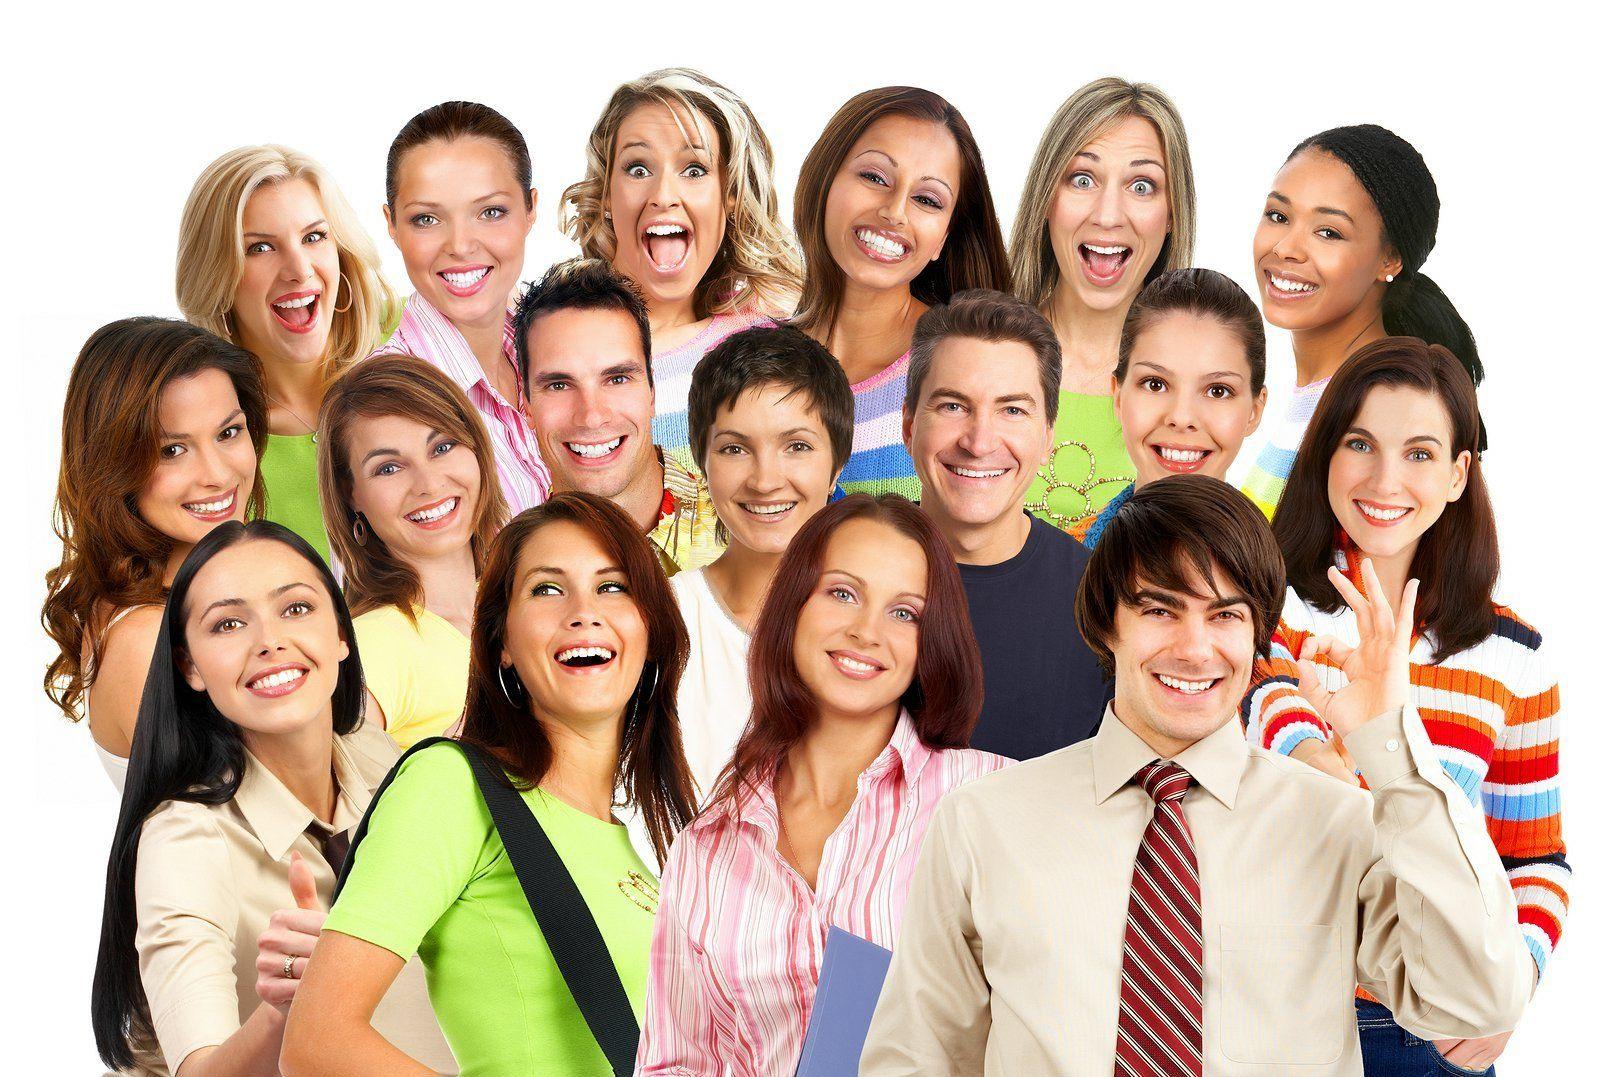 happy-smiling-people-people